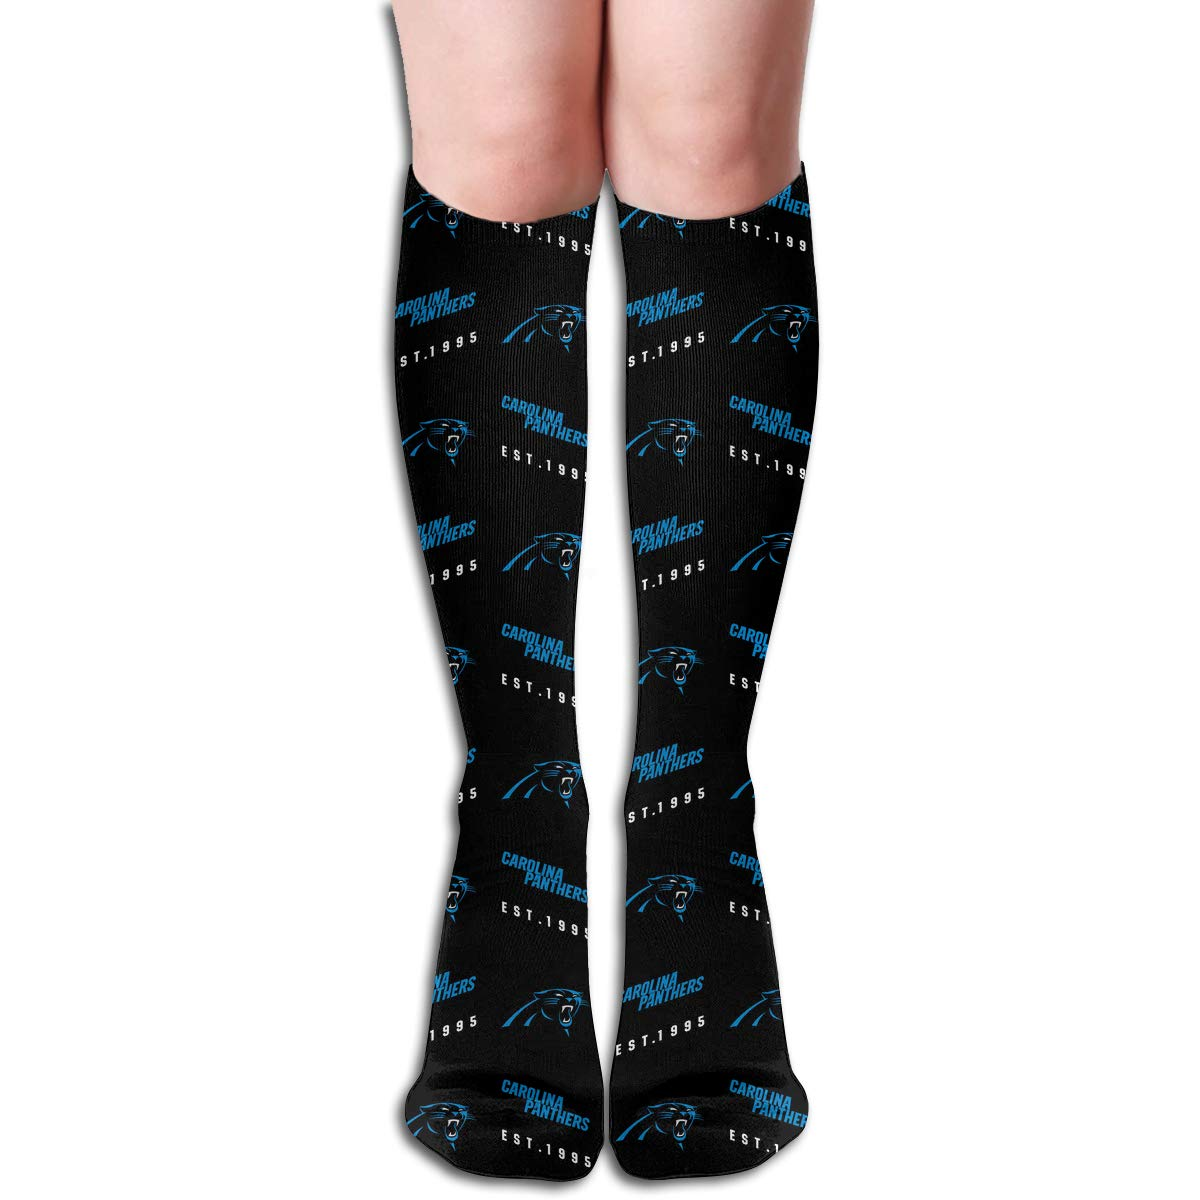 LOMELIN Custom Girls 1 Pairs Long Socks Buffalo Bills Football Team Women Casual Knee High Tube Socks Mid-Calf Gift Sock